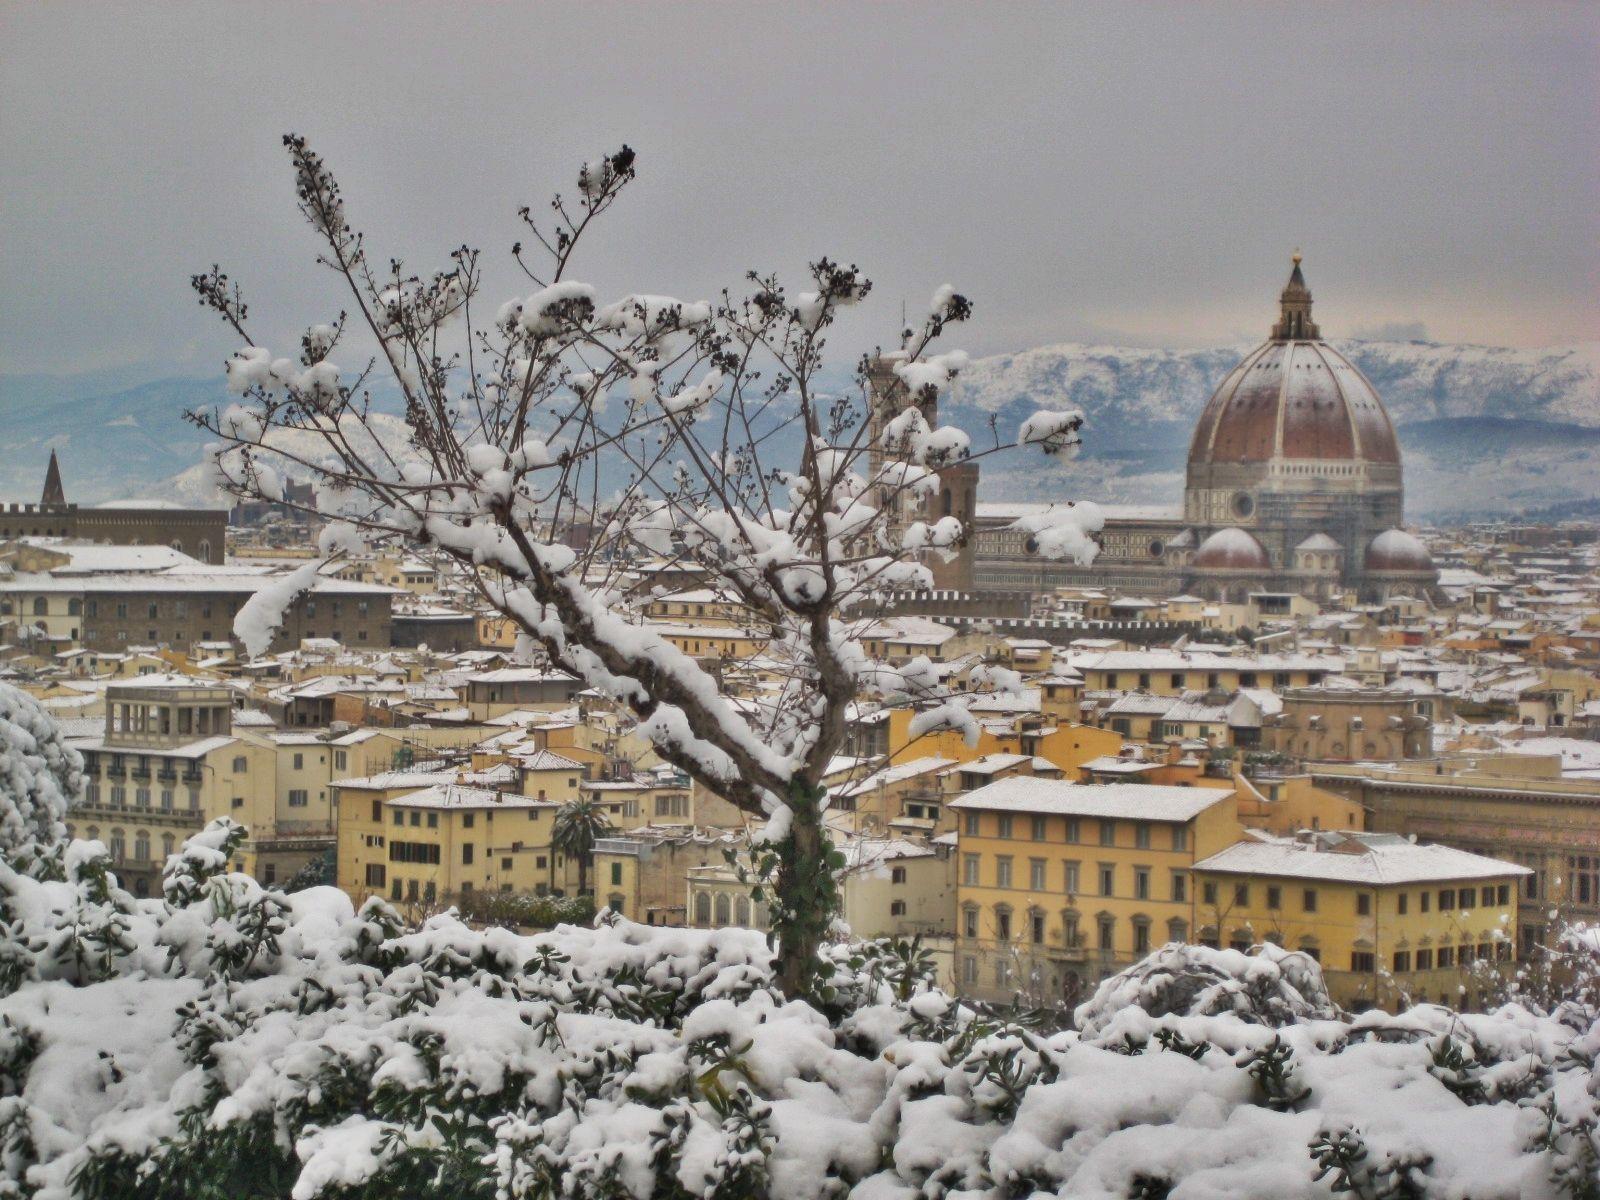 FIRENZE - Panorama sotto la neve (Toscana)